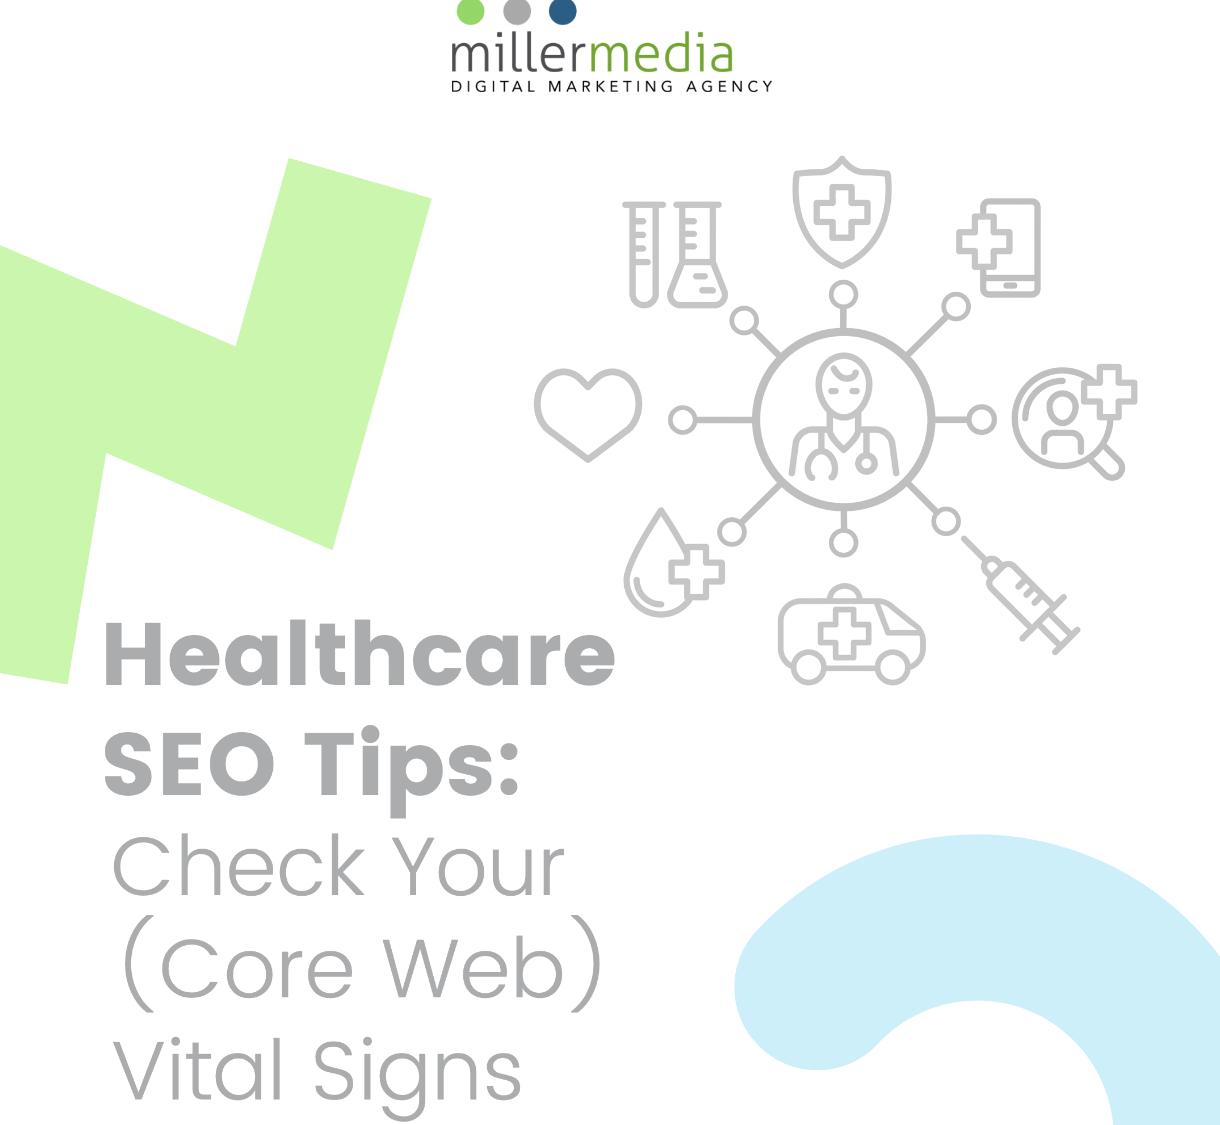 healthcare seo tips